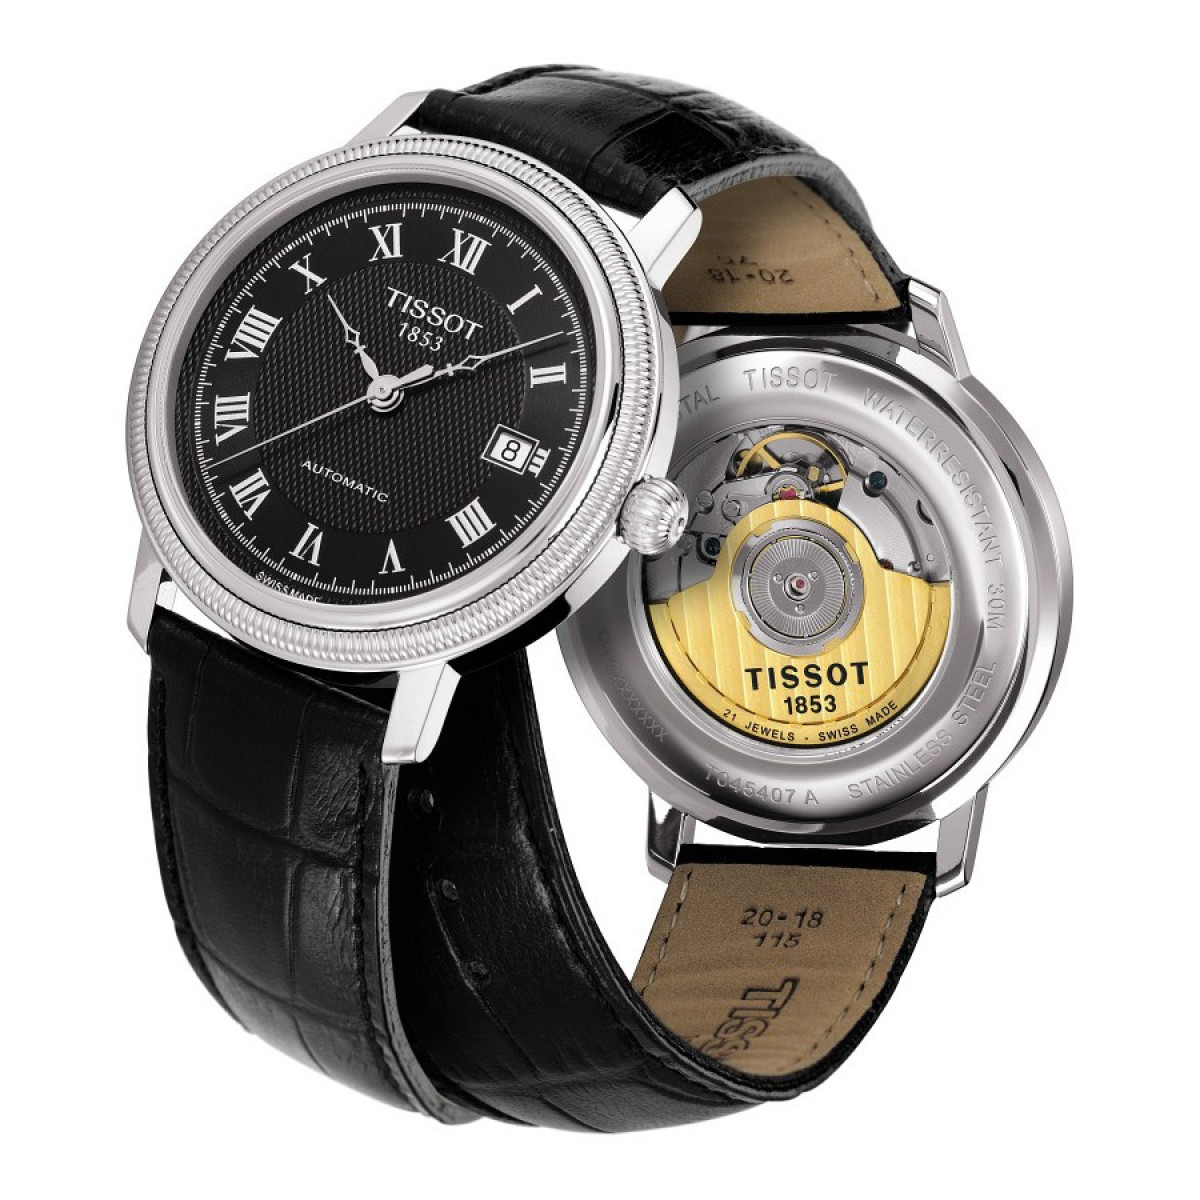 Часовник Tissot T045.407.16.053.00